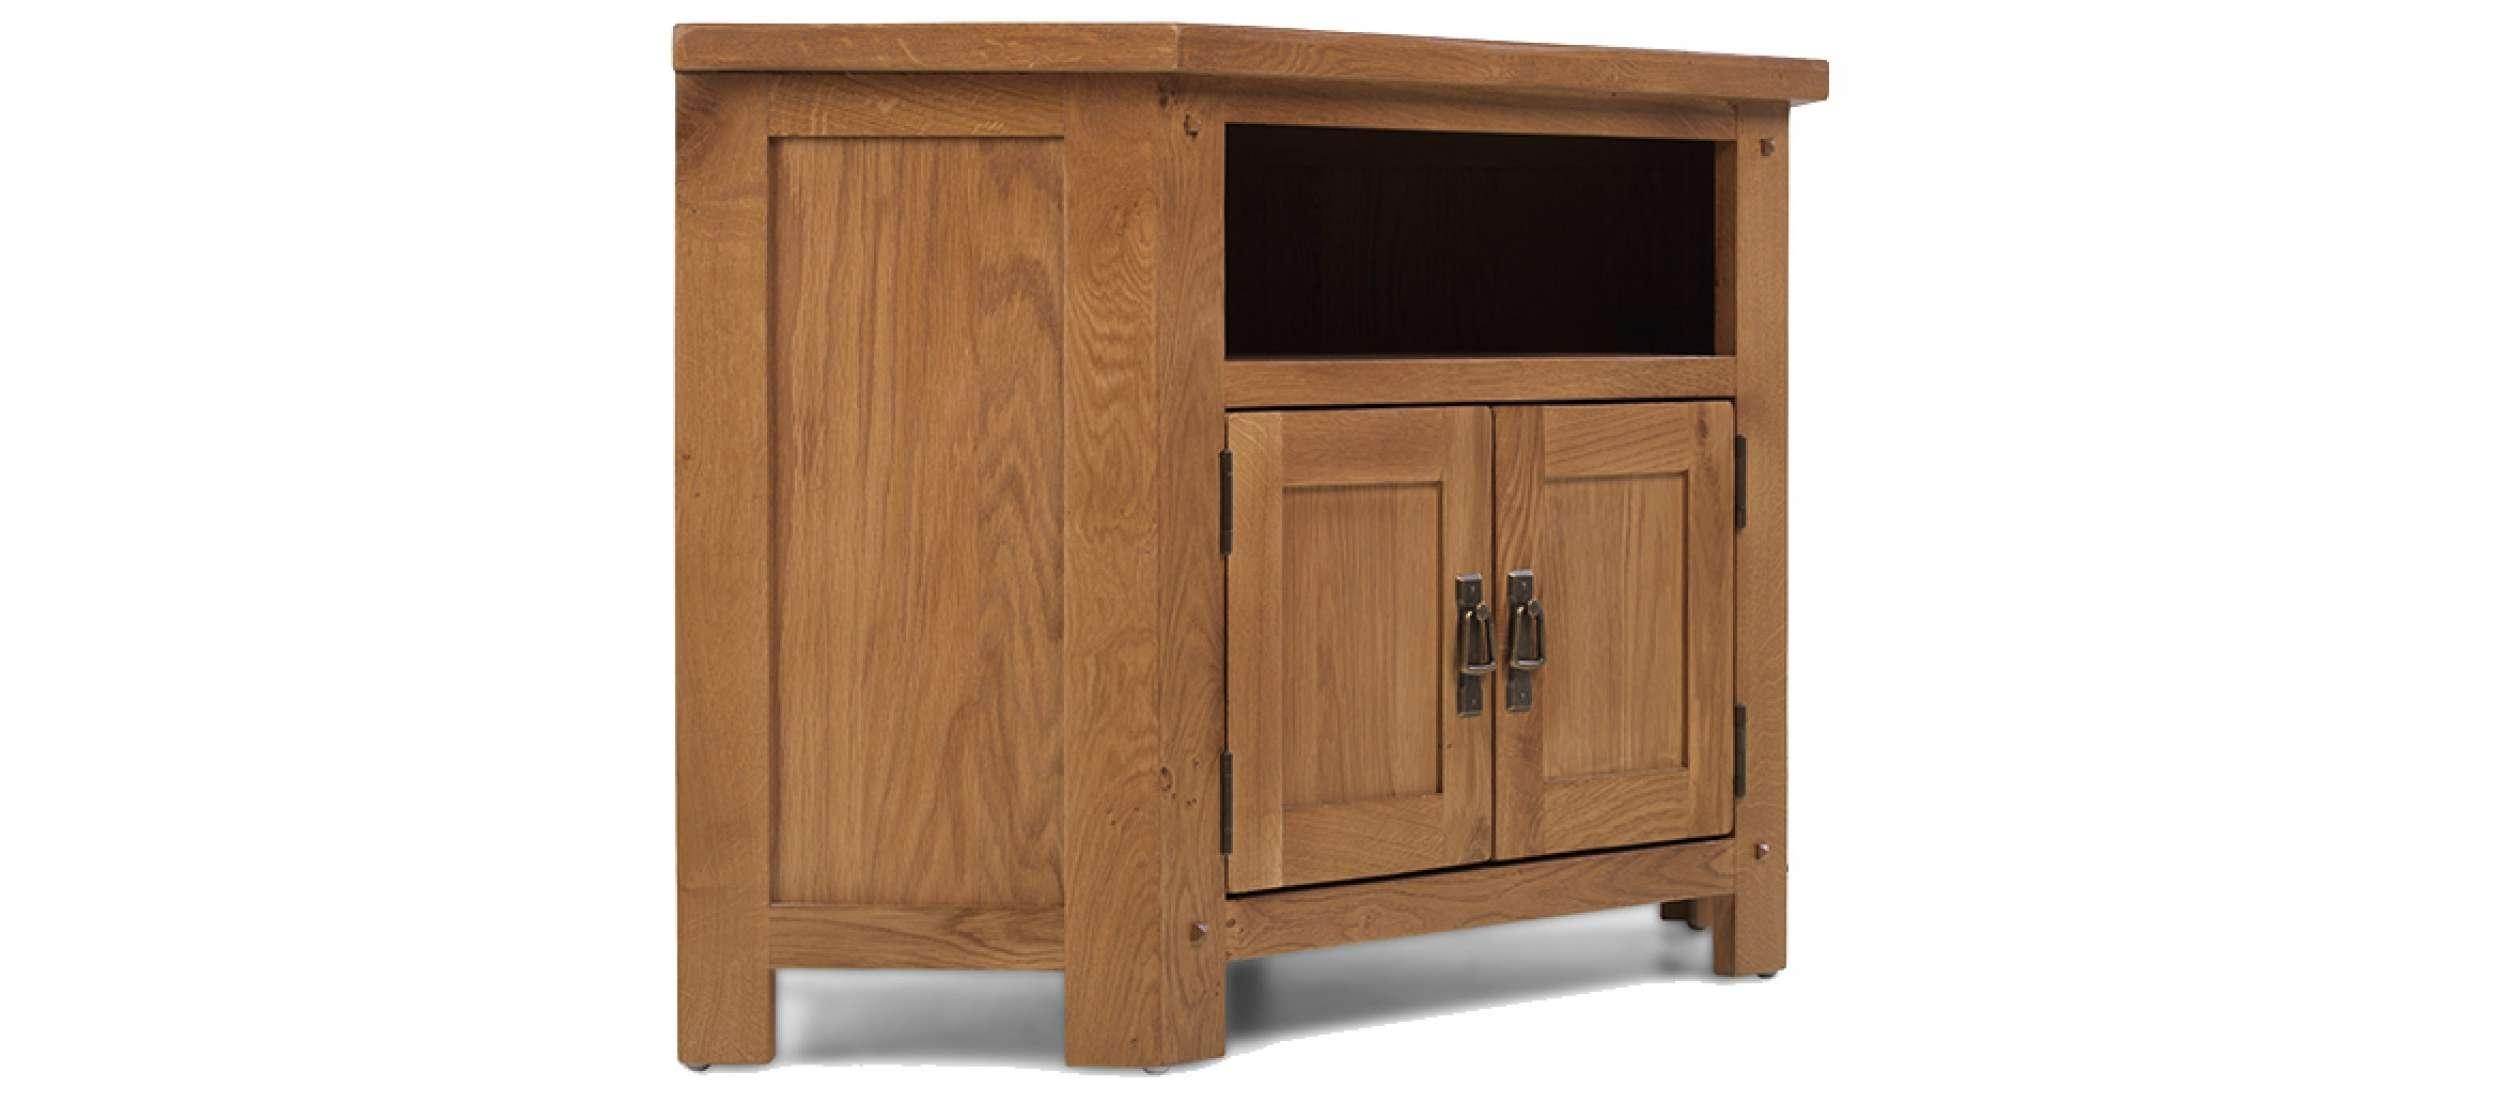 Rustic Oak Corner Tv Cabinet   Quercus Living Inside Corner Tv Cabinets (View 15 of 20)